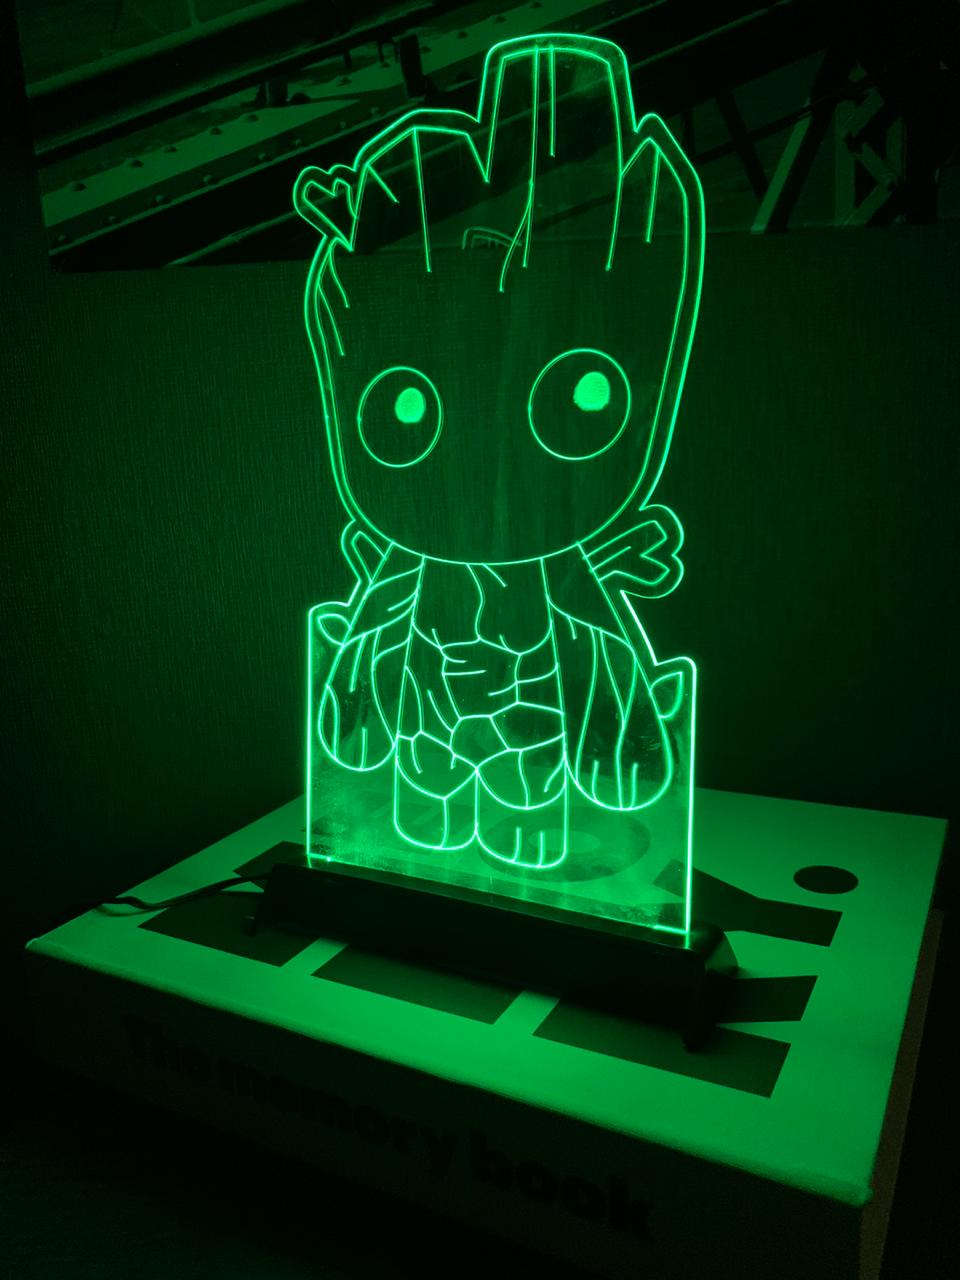 Luminária/Abajur Groot: Vingadores (Avengers) - Marvel